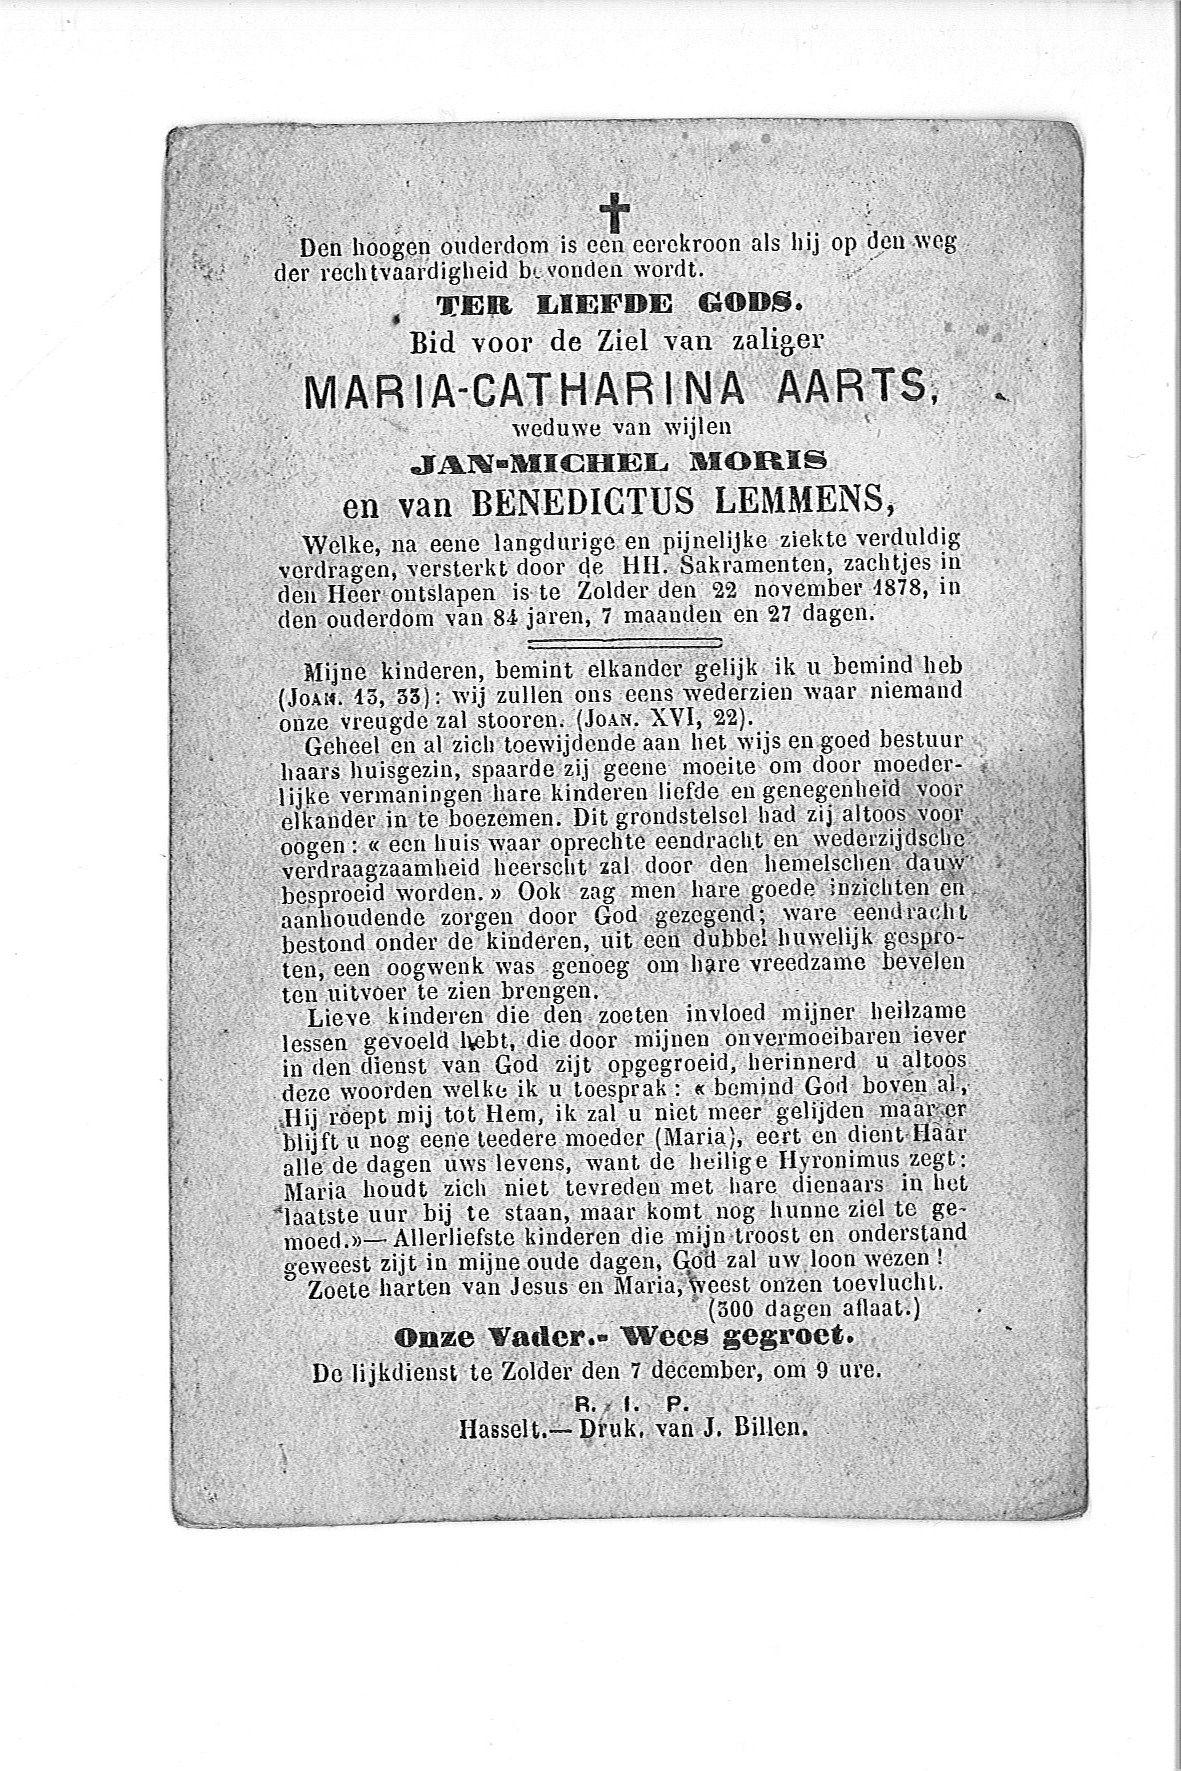 maria-catharina(1878)20090105132822_00005.jpg